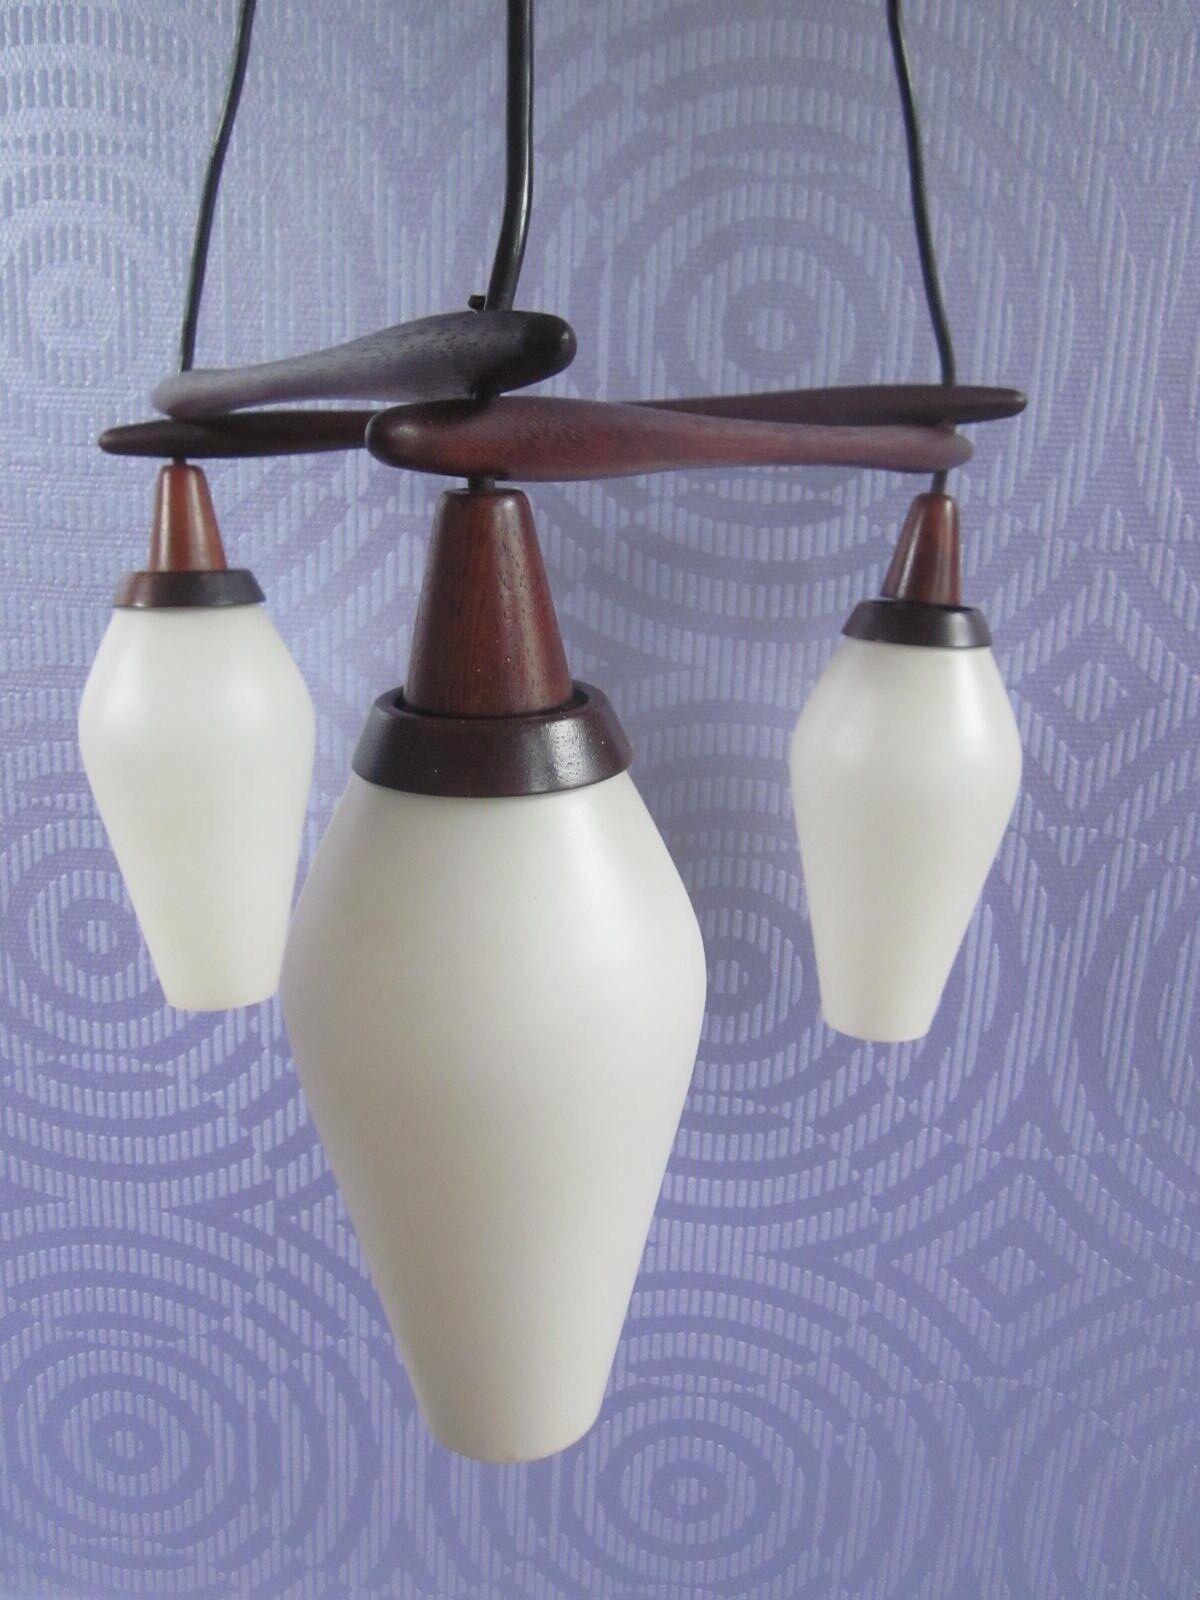 Teck Lampe suspension Lampe 50 s s 60 s s mid-century DANEMARK Danish Modern Era Vittsjö 912010